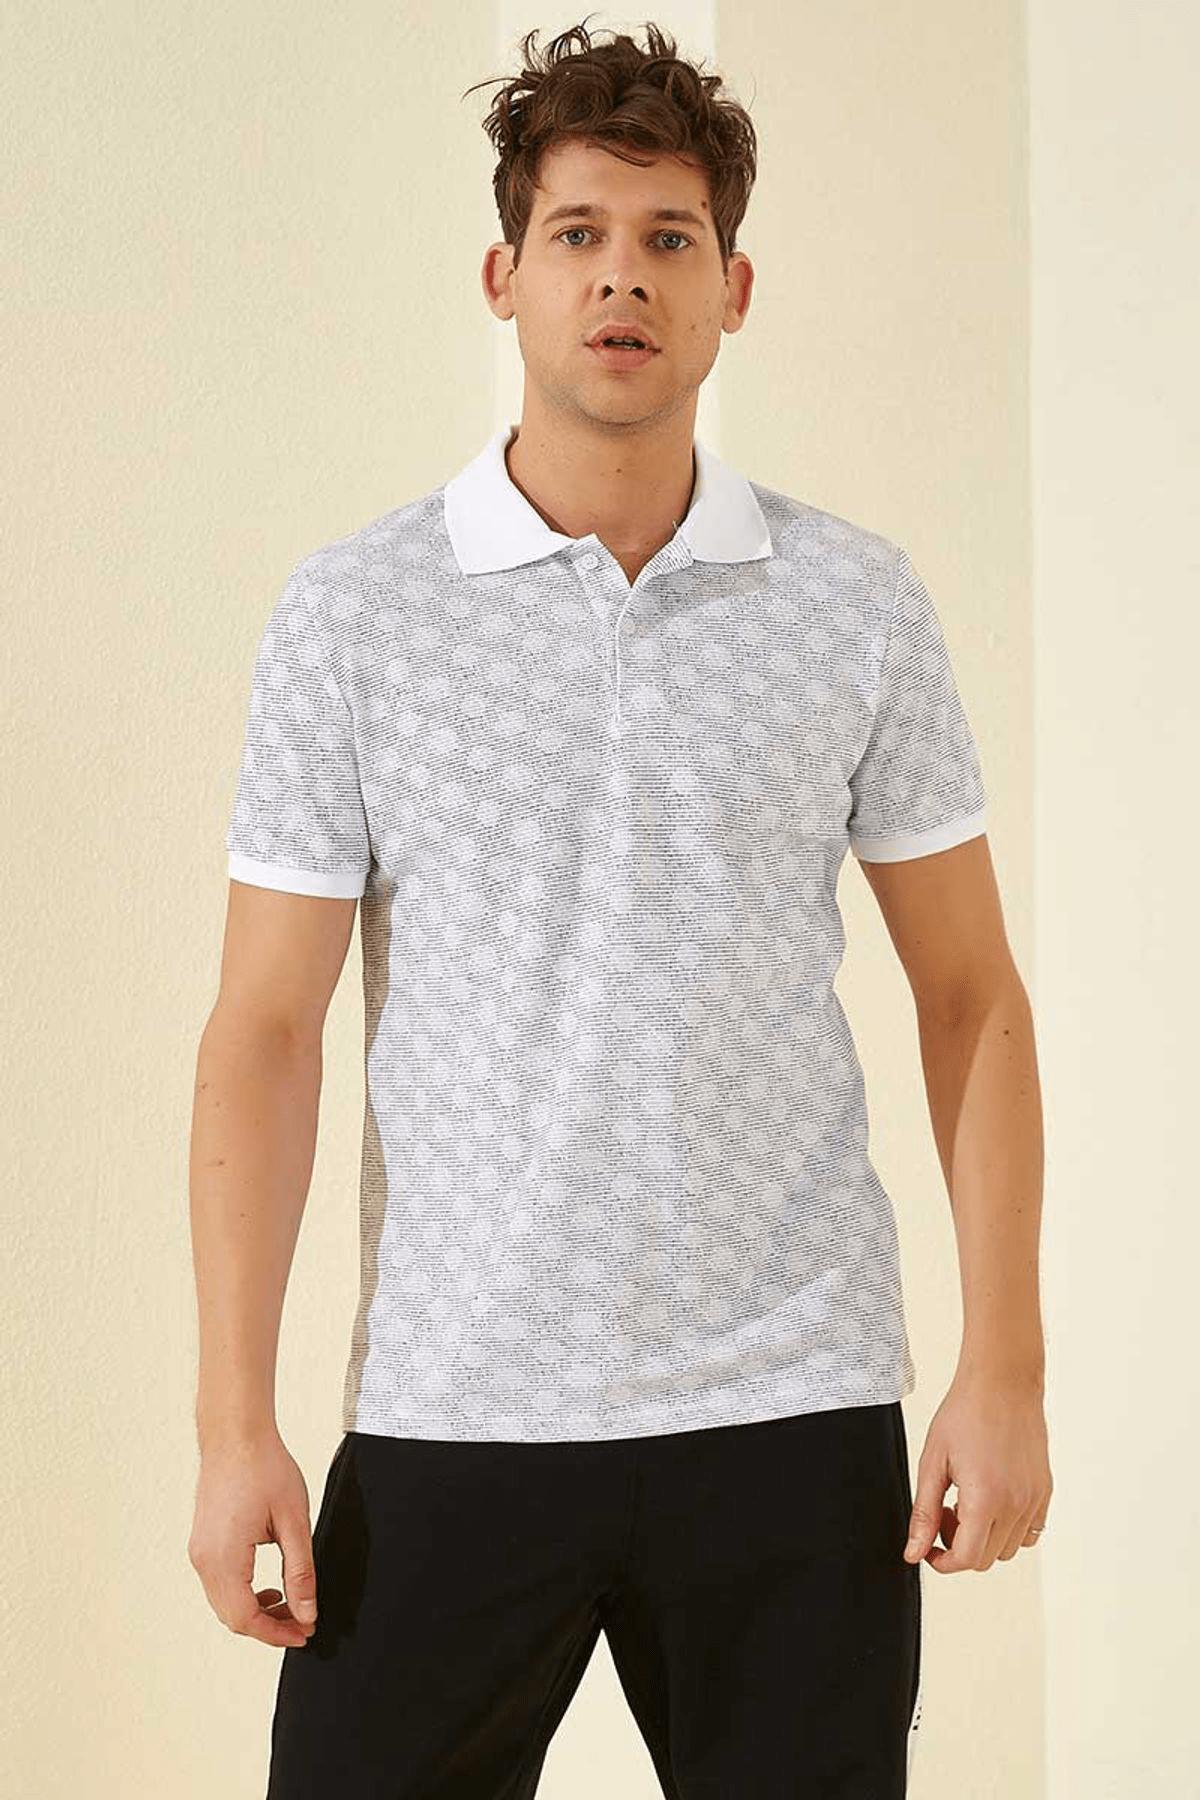 Tommy Life Baskılı Polo Yaka Beyaz Erkek T-Shirt T08ER-87796_1 0